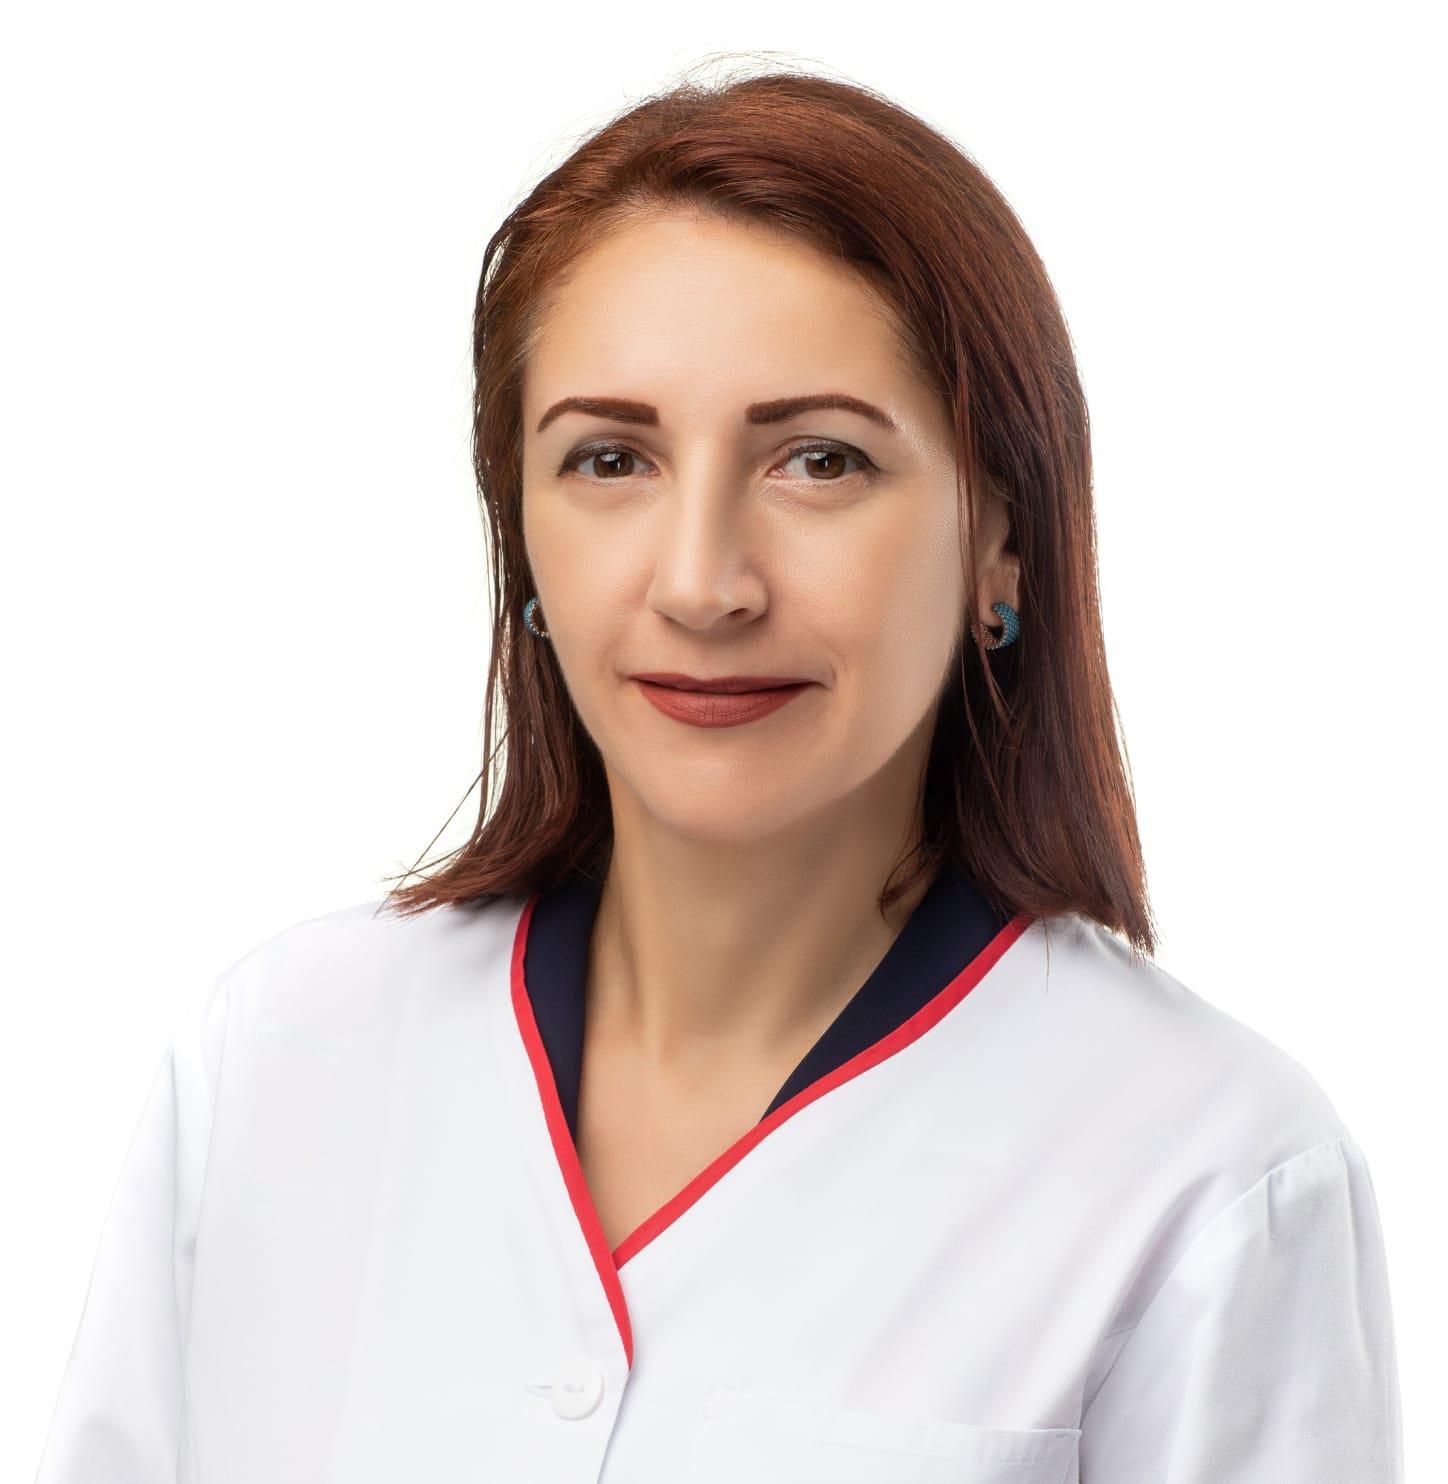 Dr. Ioana Cristina Buzoianu